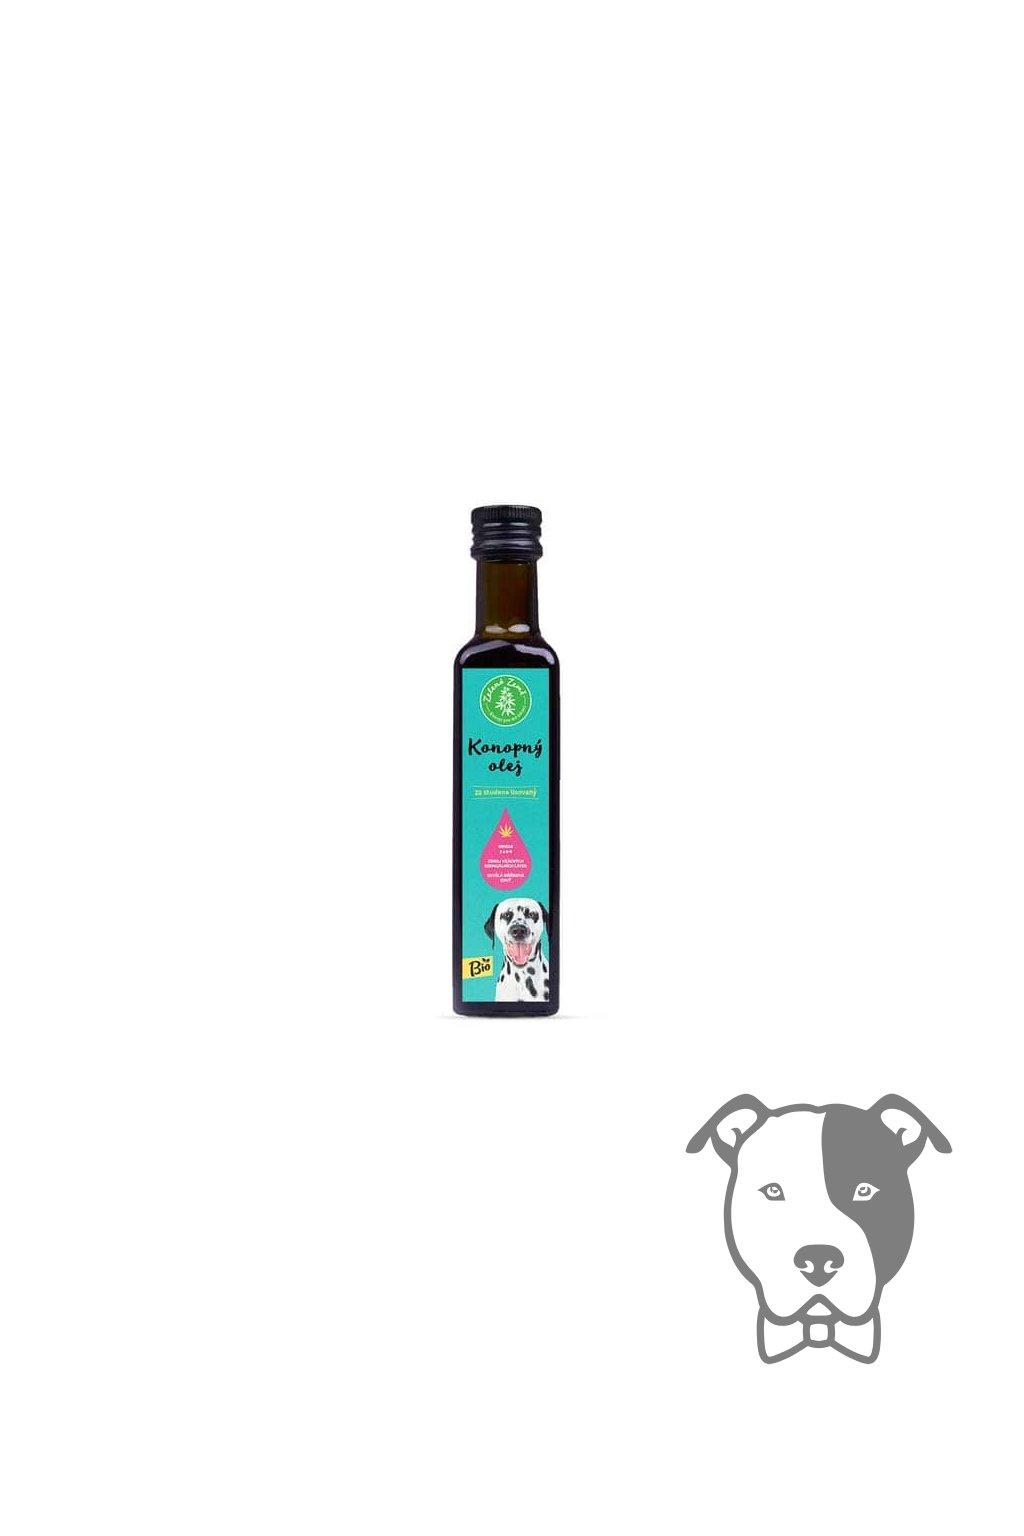 psi konopny olej cz 250ml mockup1